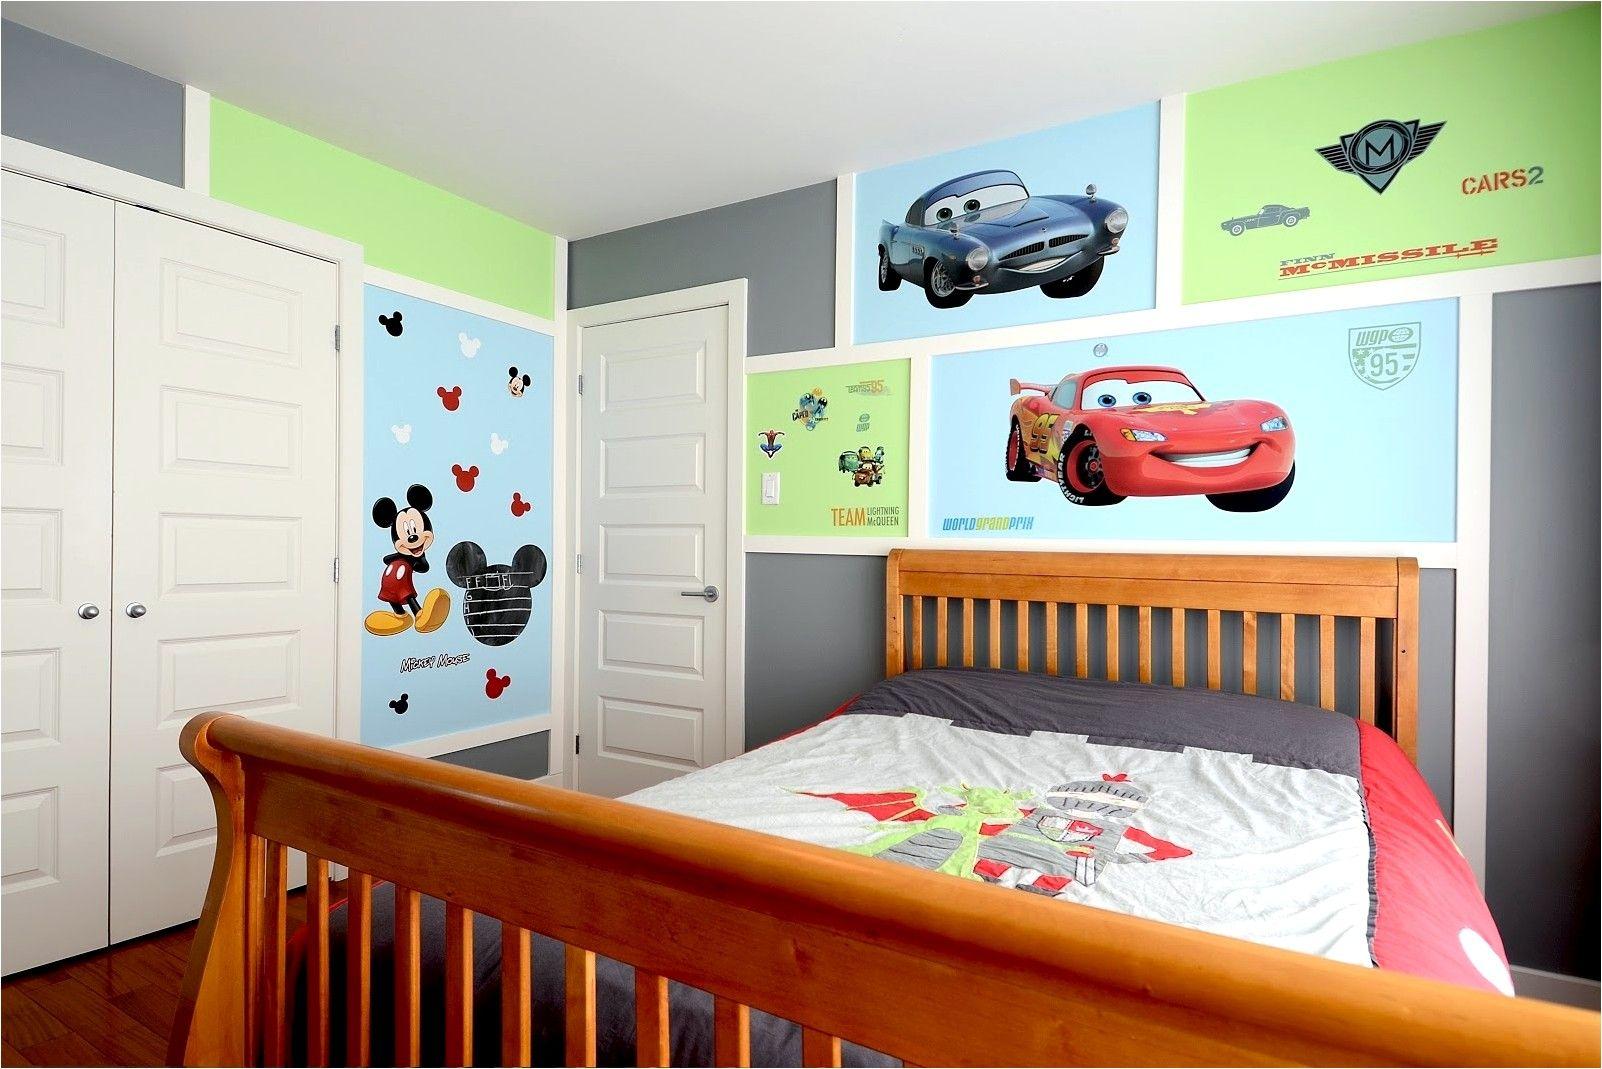 Deco Chambre D Enfant 4 Ans In 2020 Toddler Bed